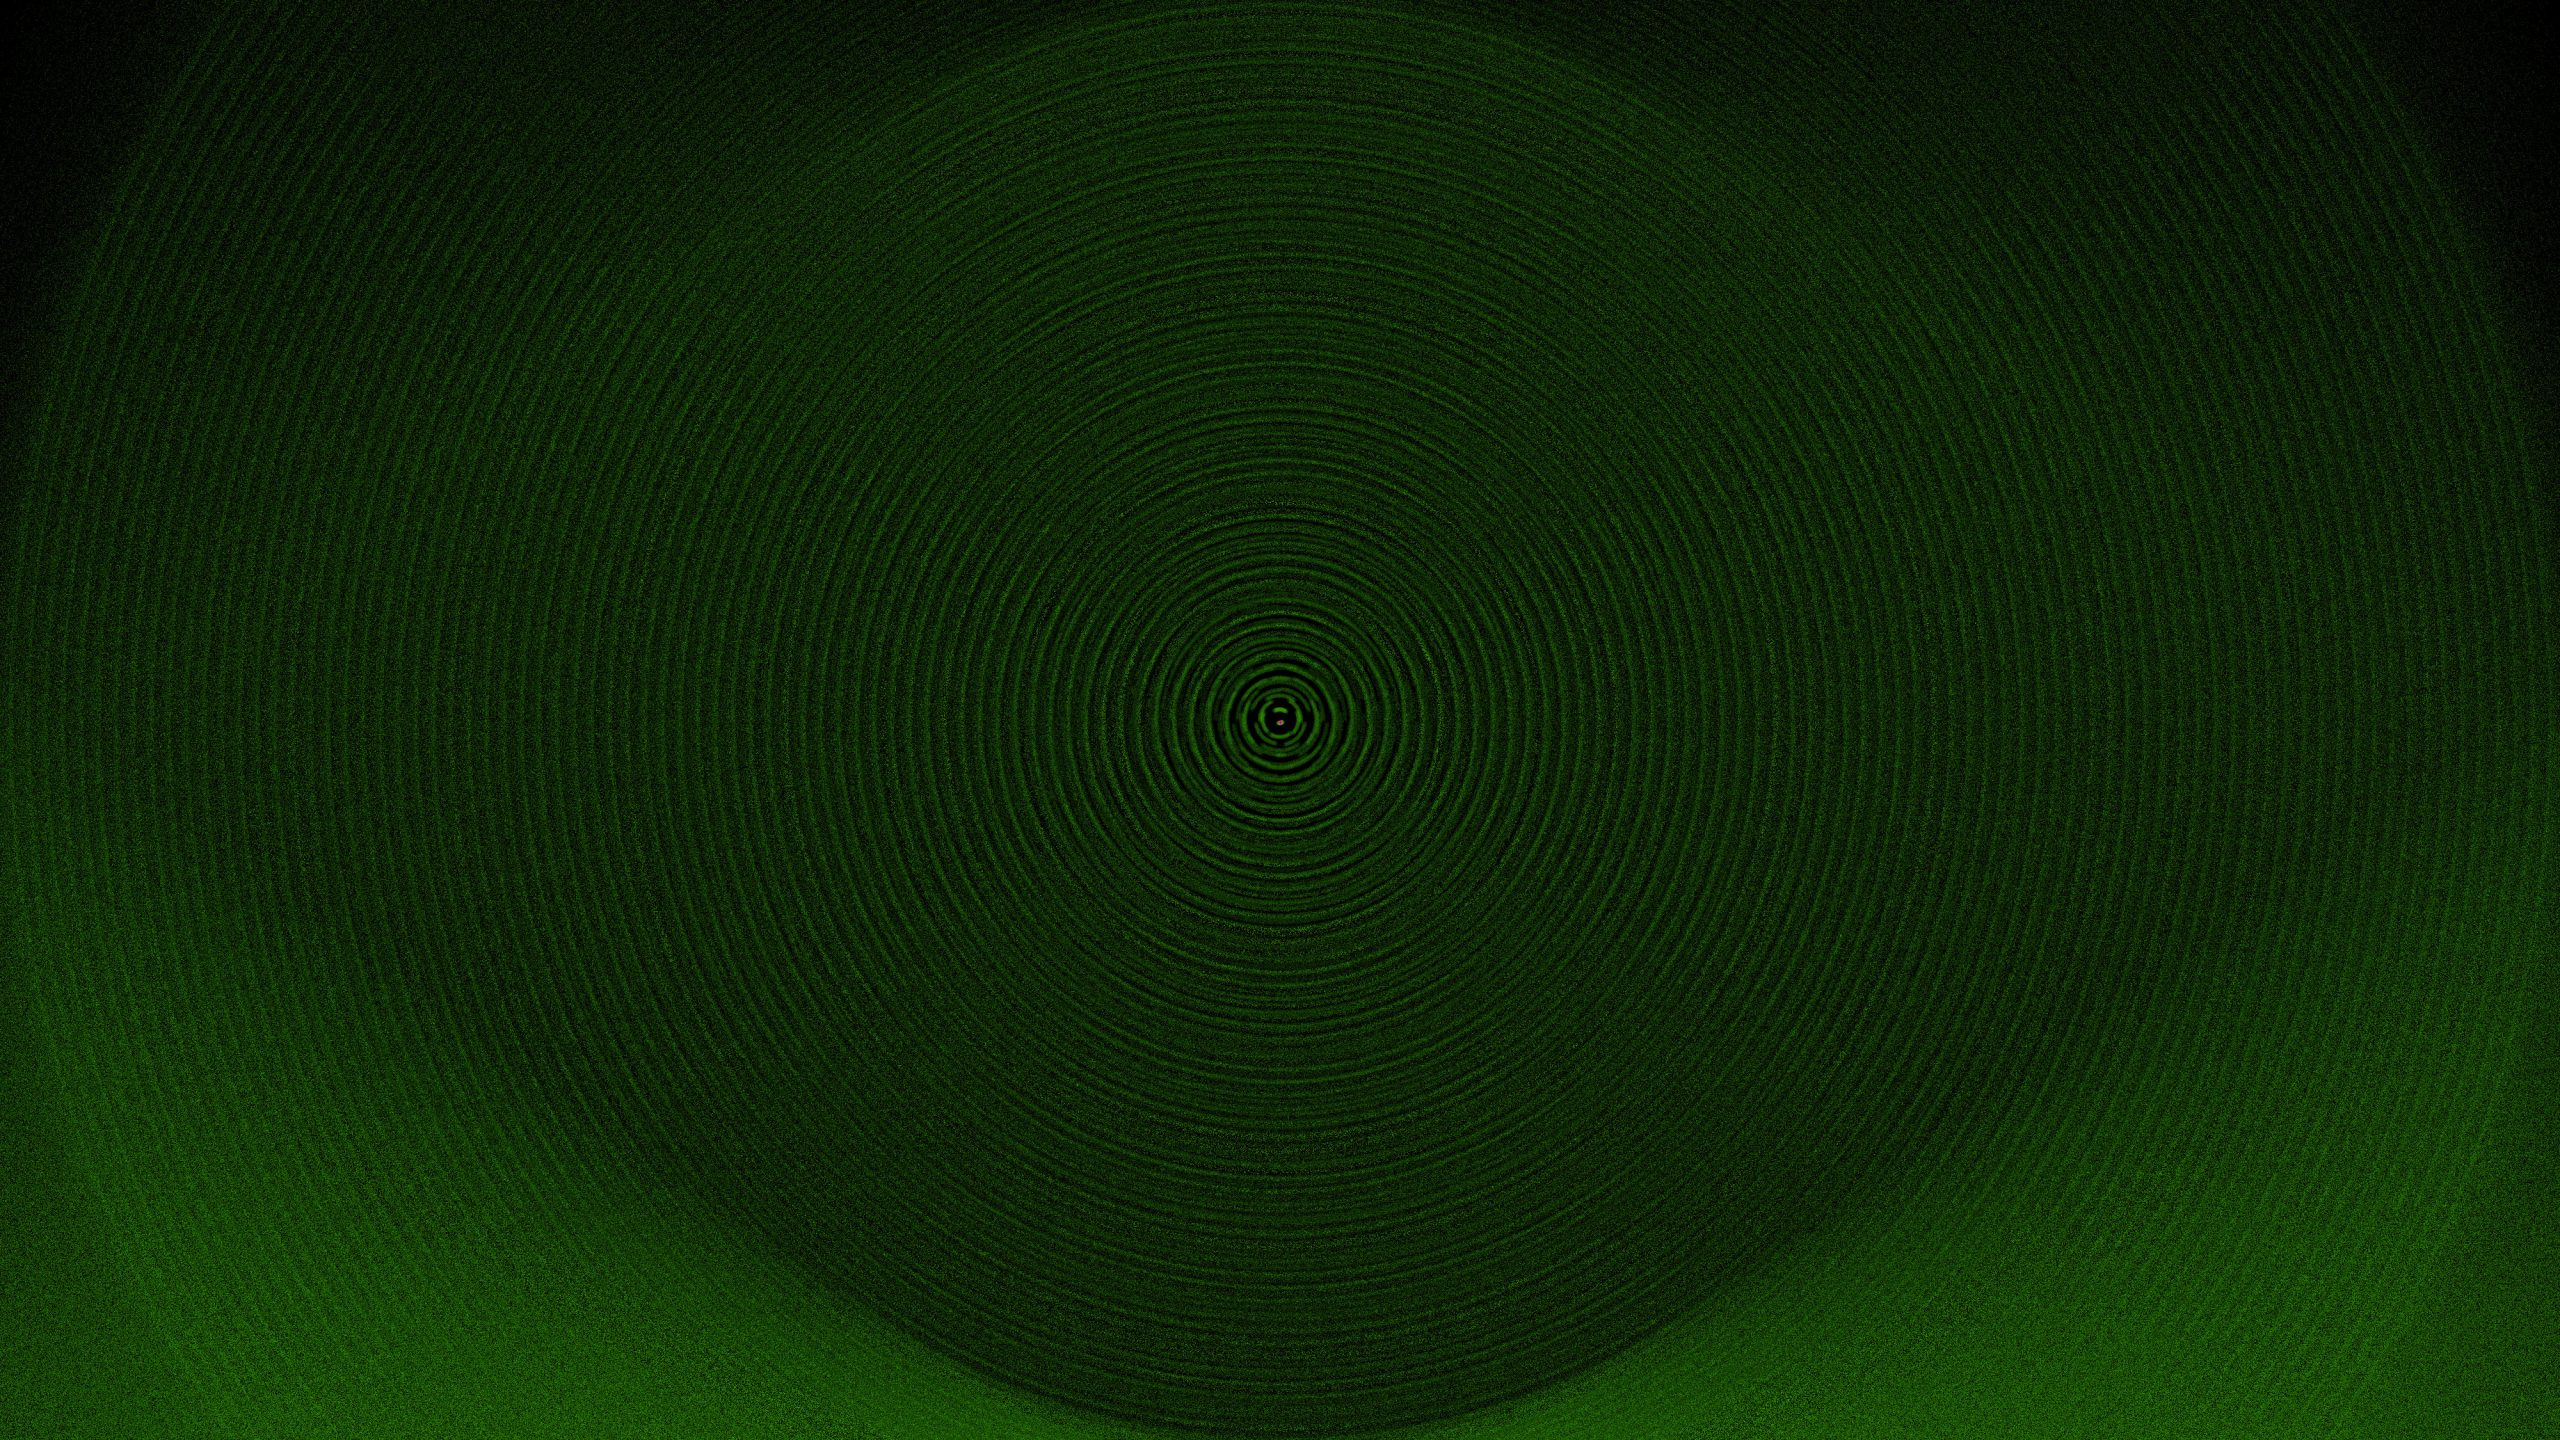 Dark green color wallpaper